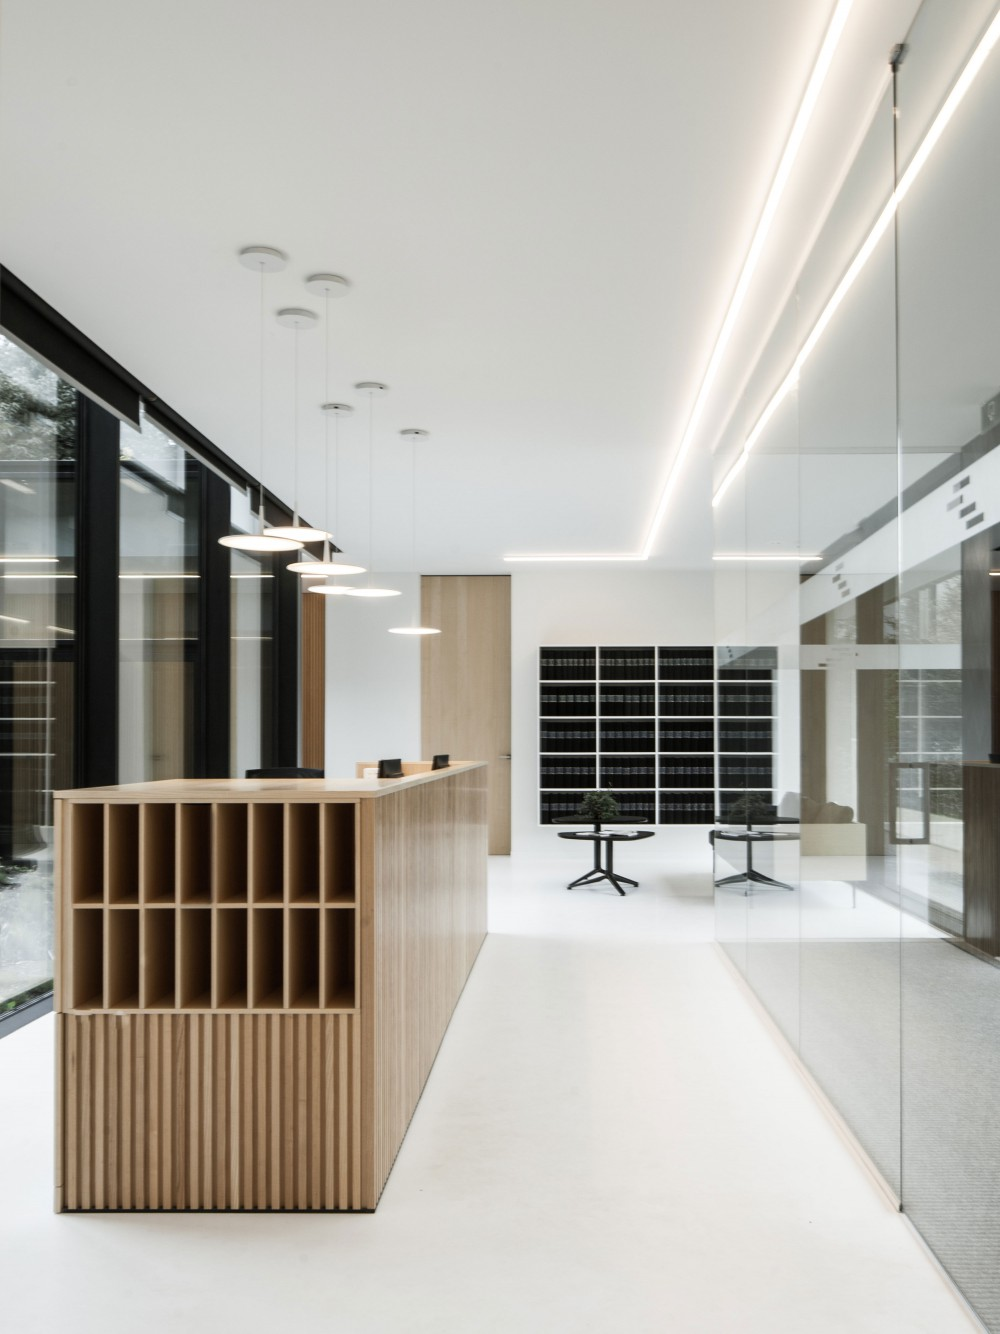 Abscis Architecten - reception area with desk - photo Jeroen Verrecht